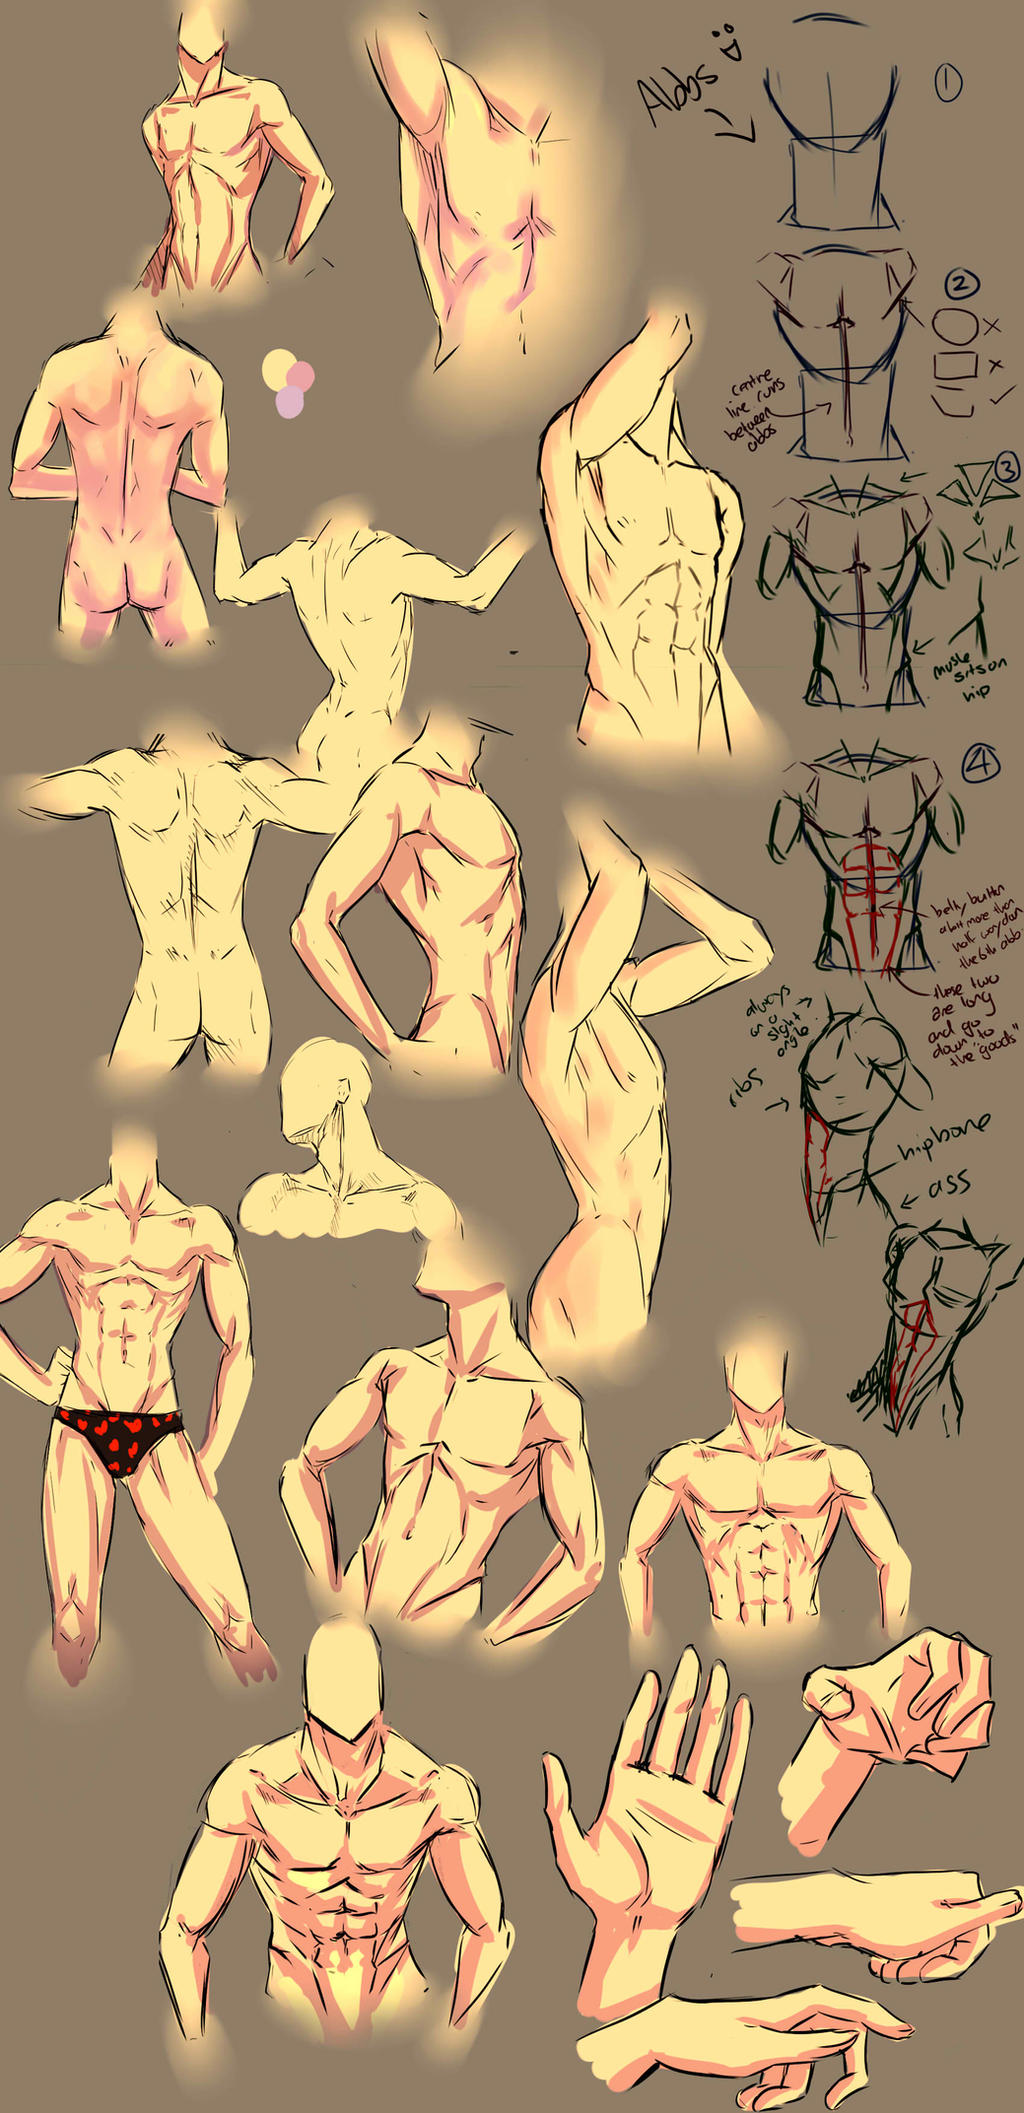 anime male anatomy - HD1024×2113